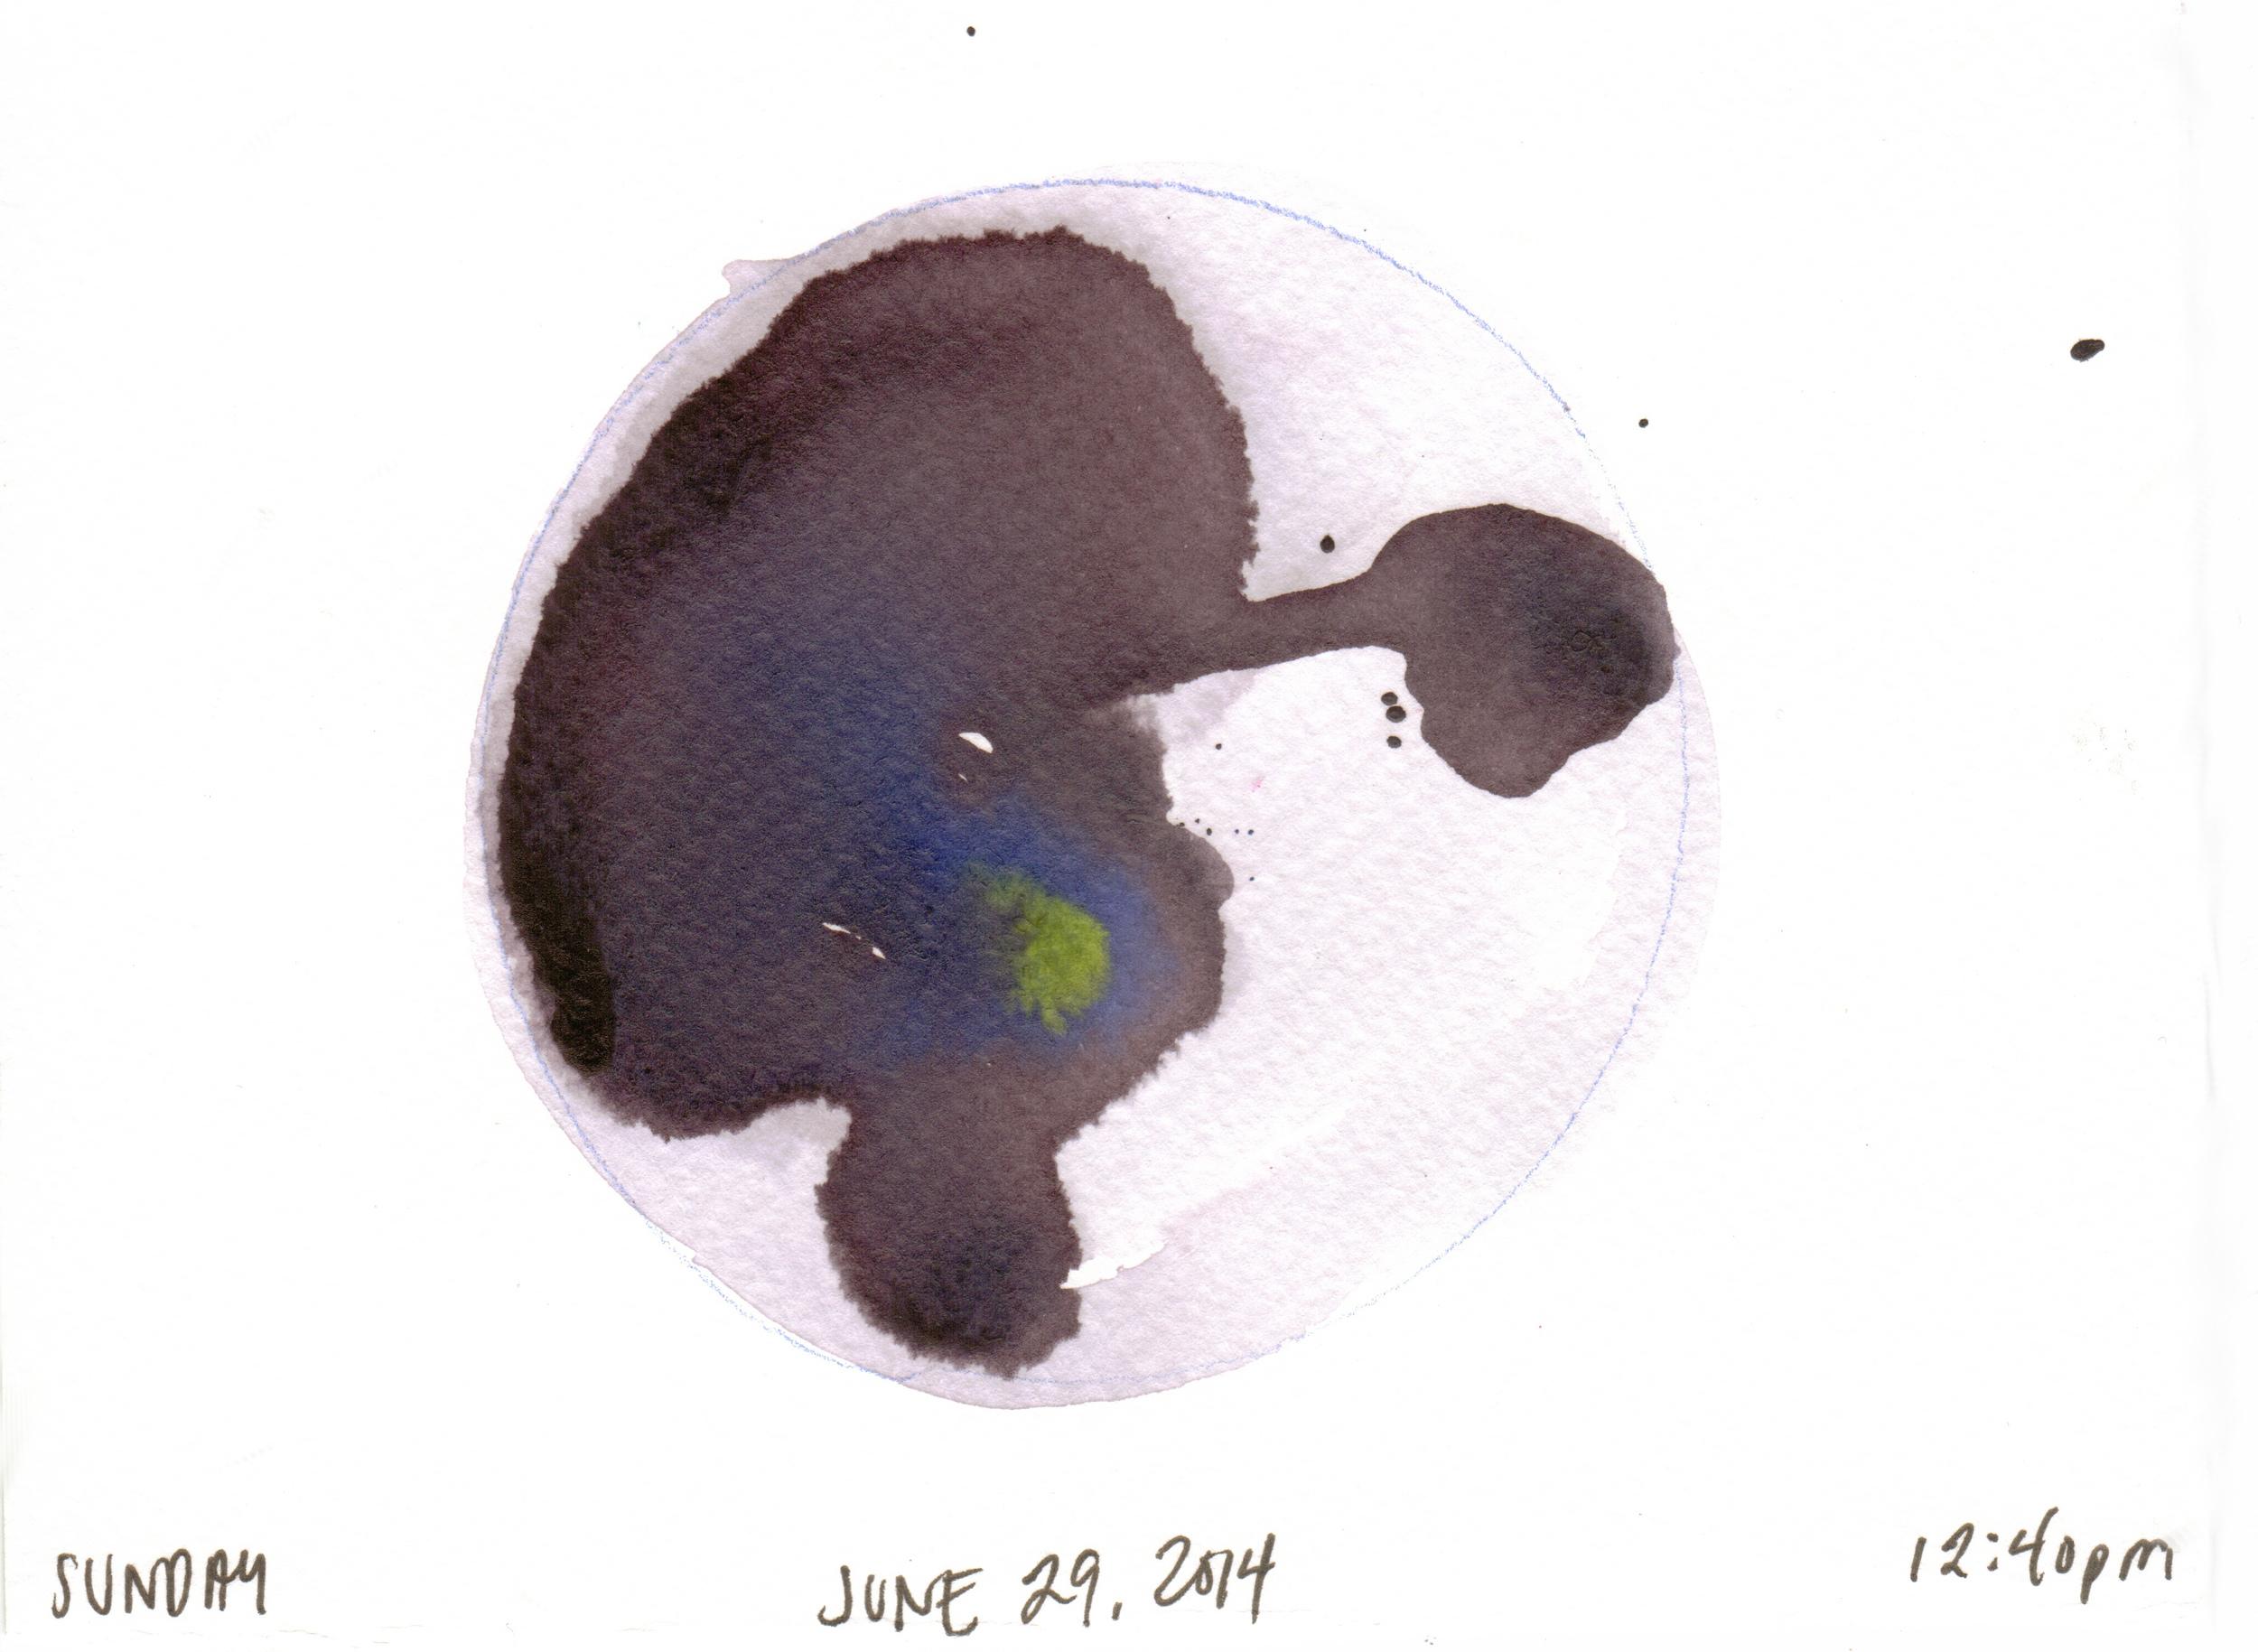 06.29.14